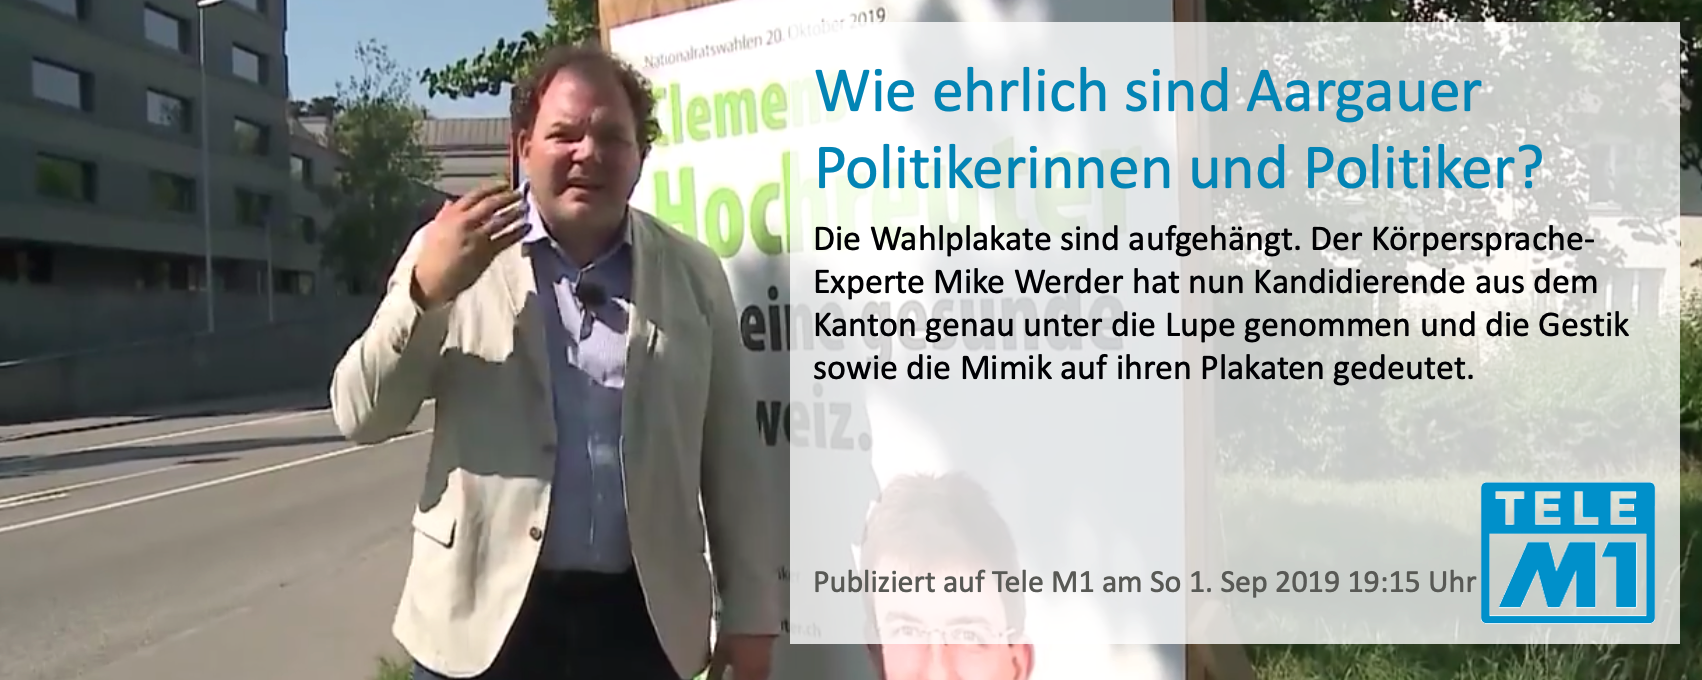 Habegger-Consulting-Beitrag-Mike-Werder-TeleM1